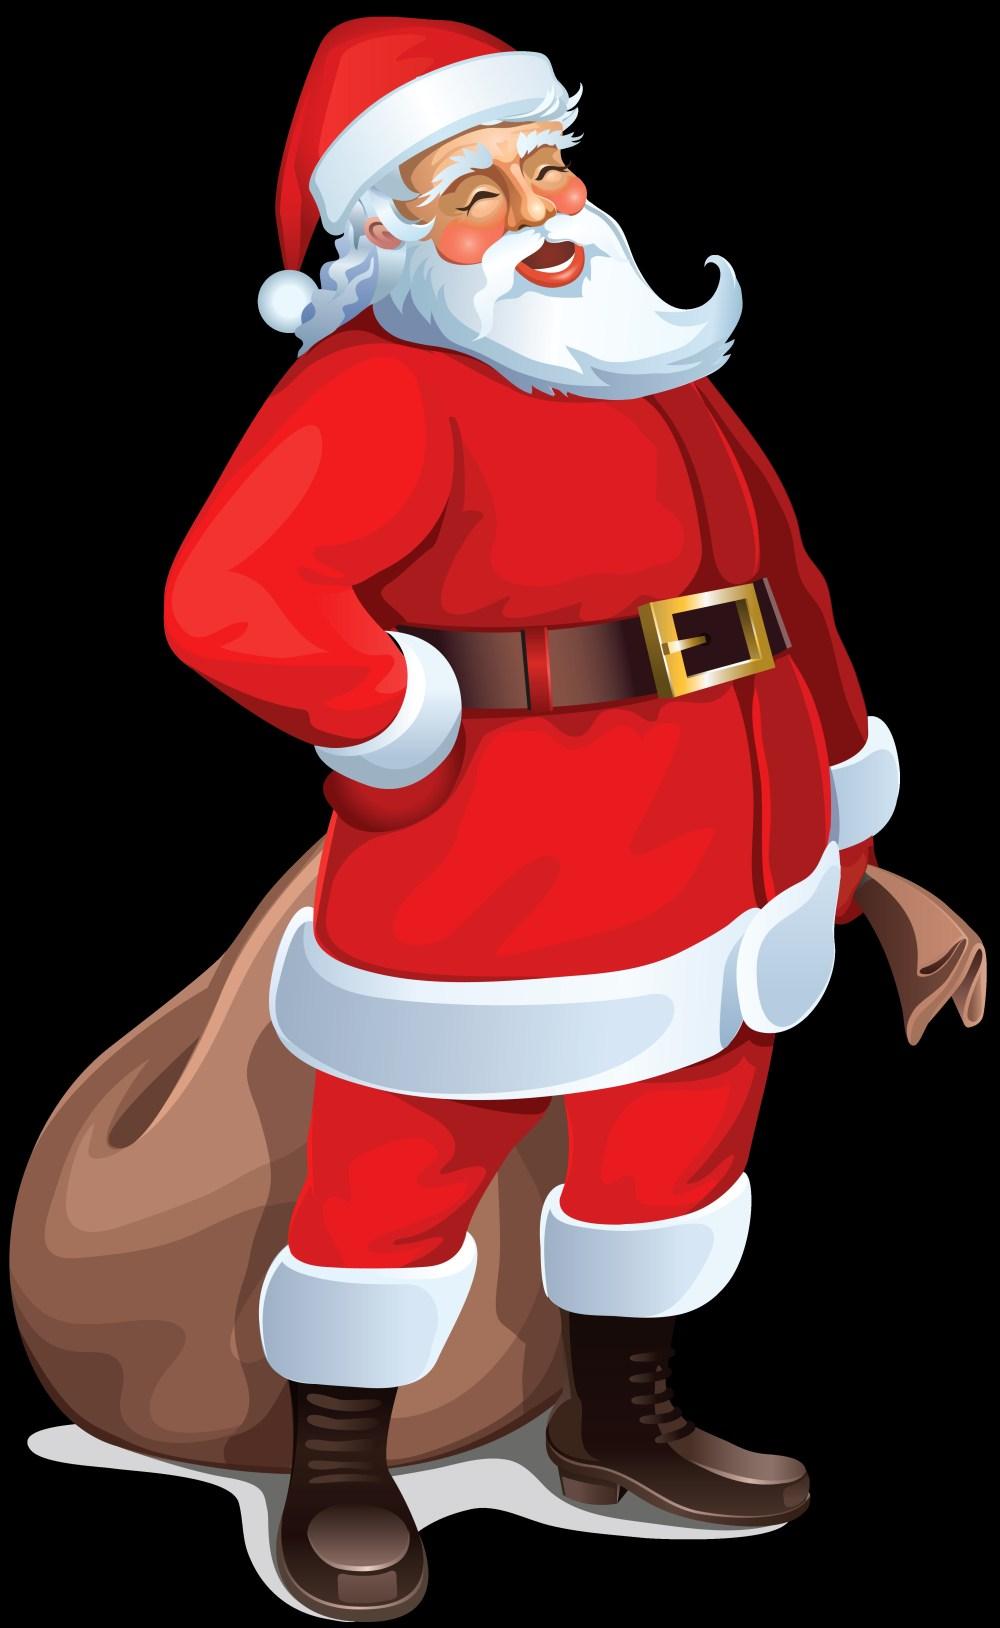 medium resolution of santa claus clipart hd image wallpaper